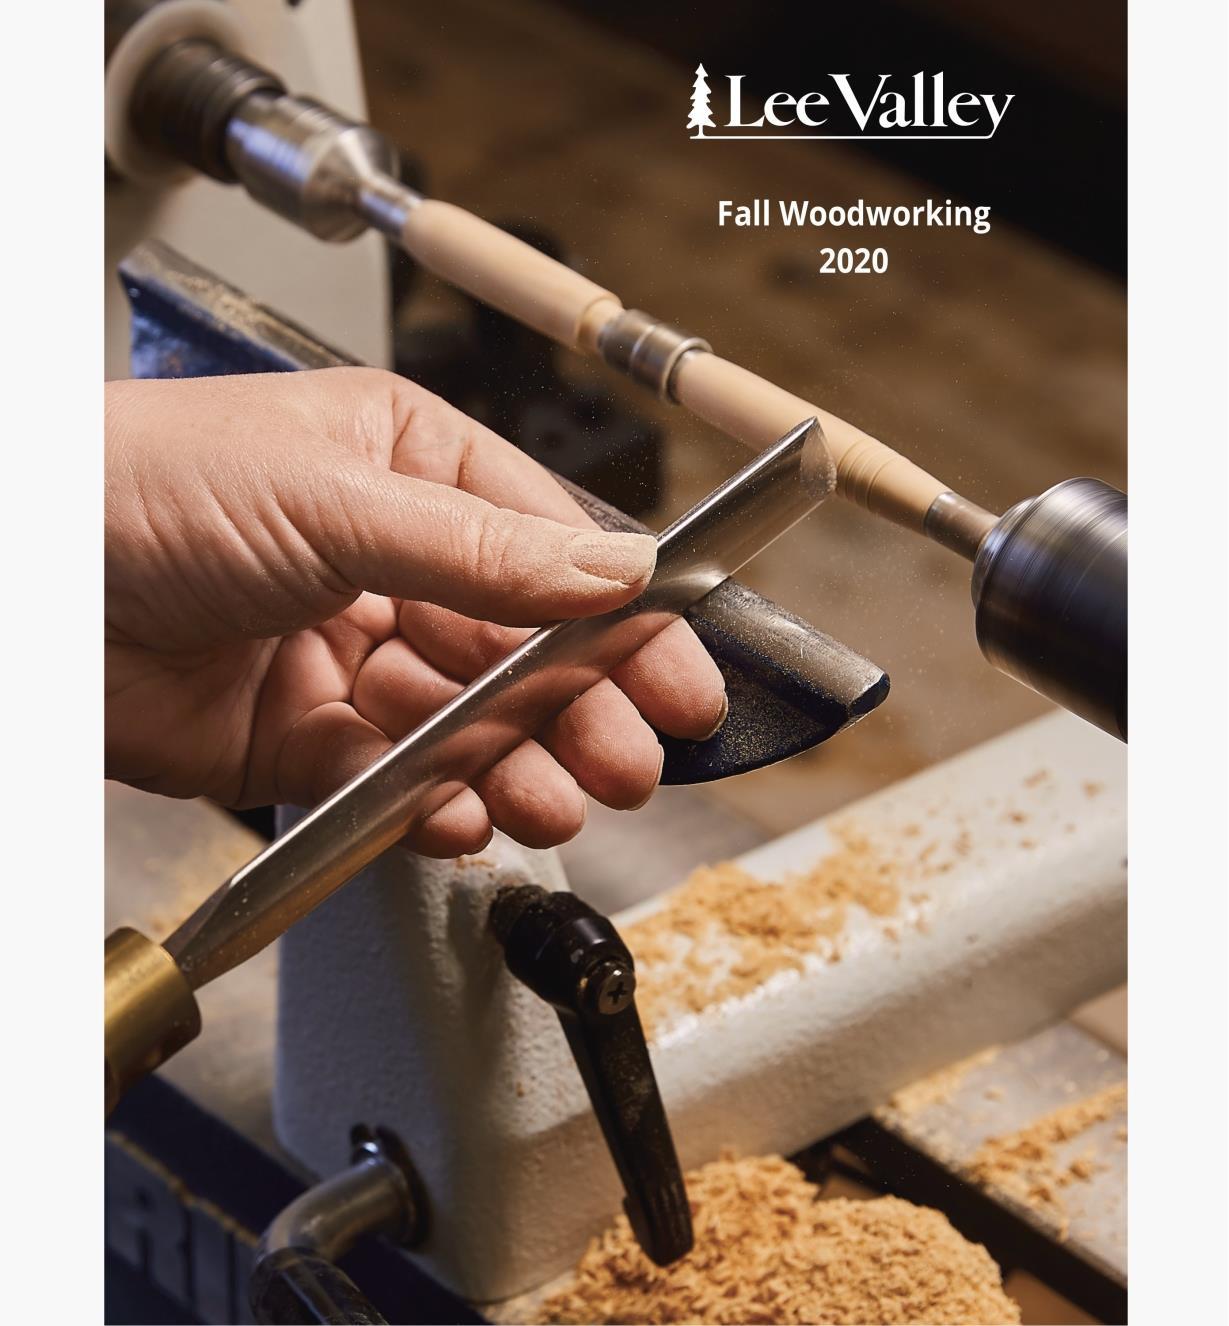 U1020W - Fall Woodworking 2020